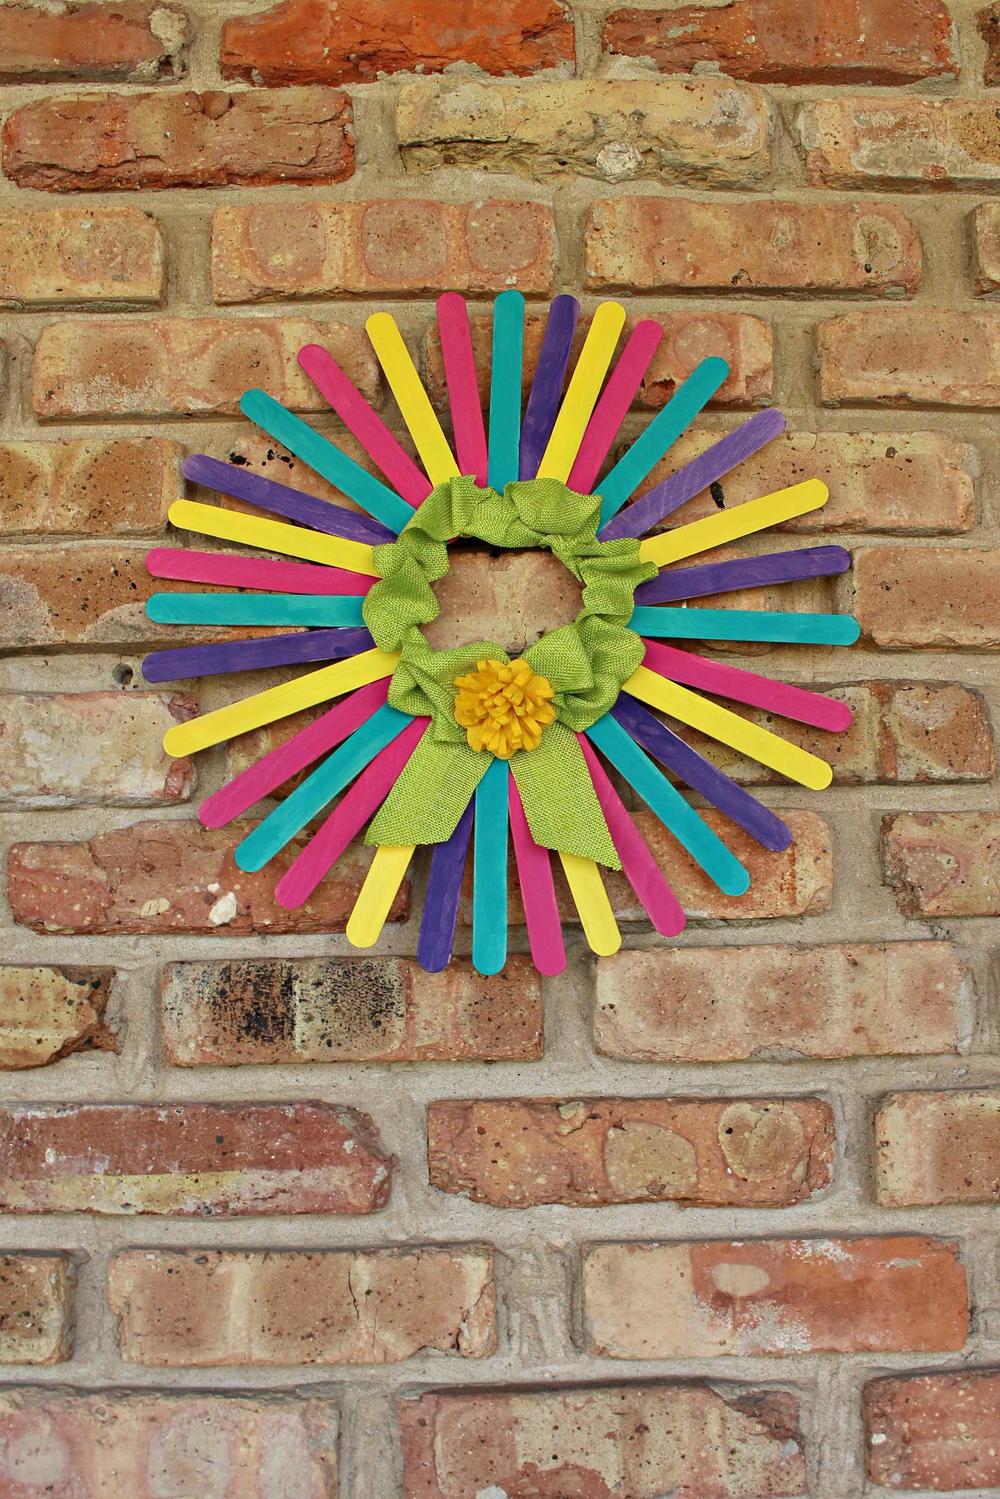 DIY Spring Wreath with Craft Sticks